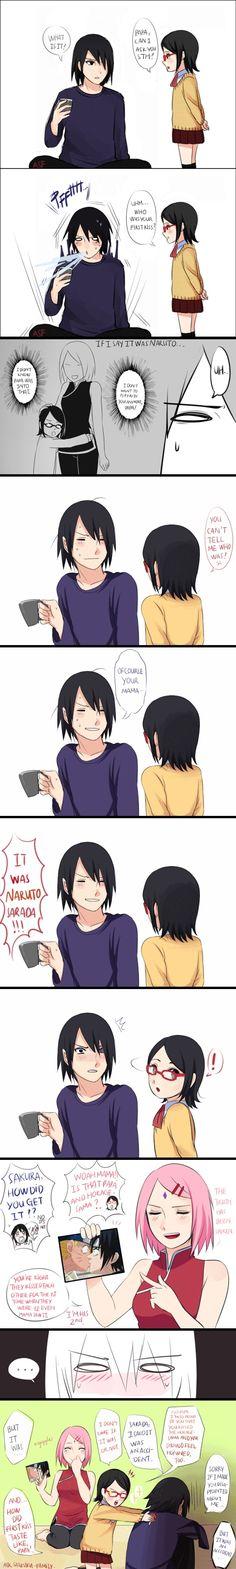 Hahahahahaha it was an accident....xD